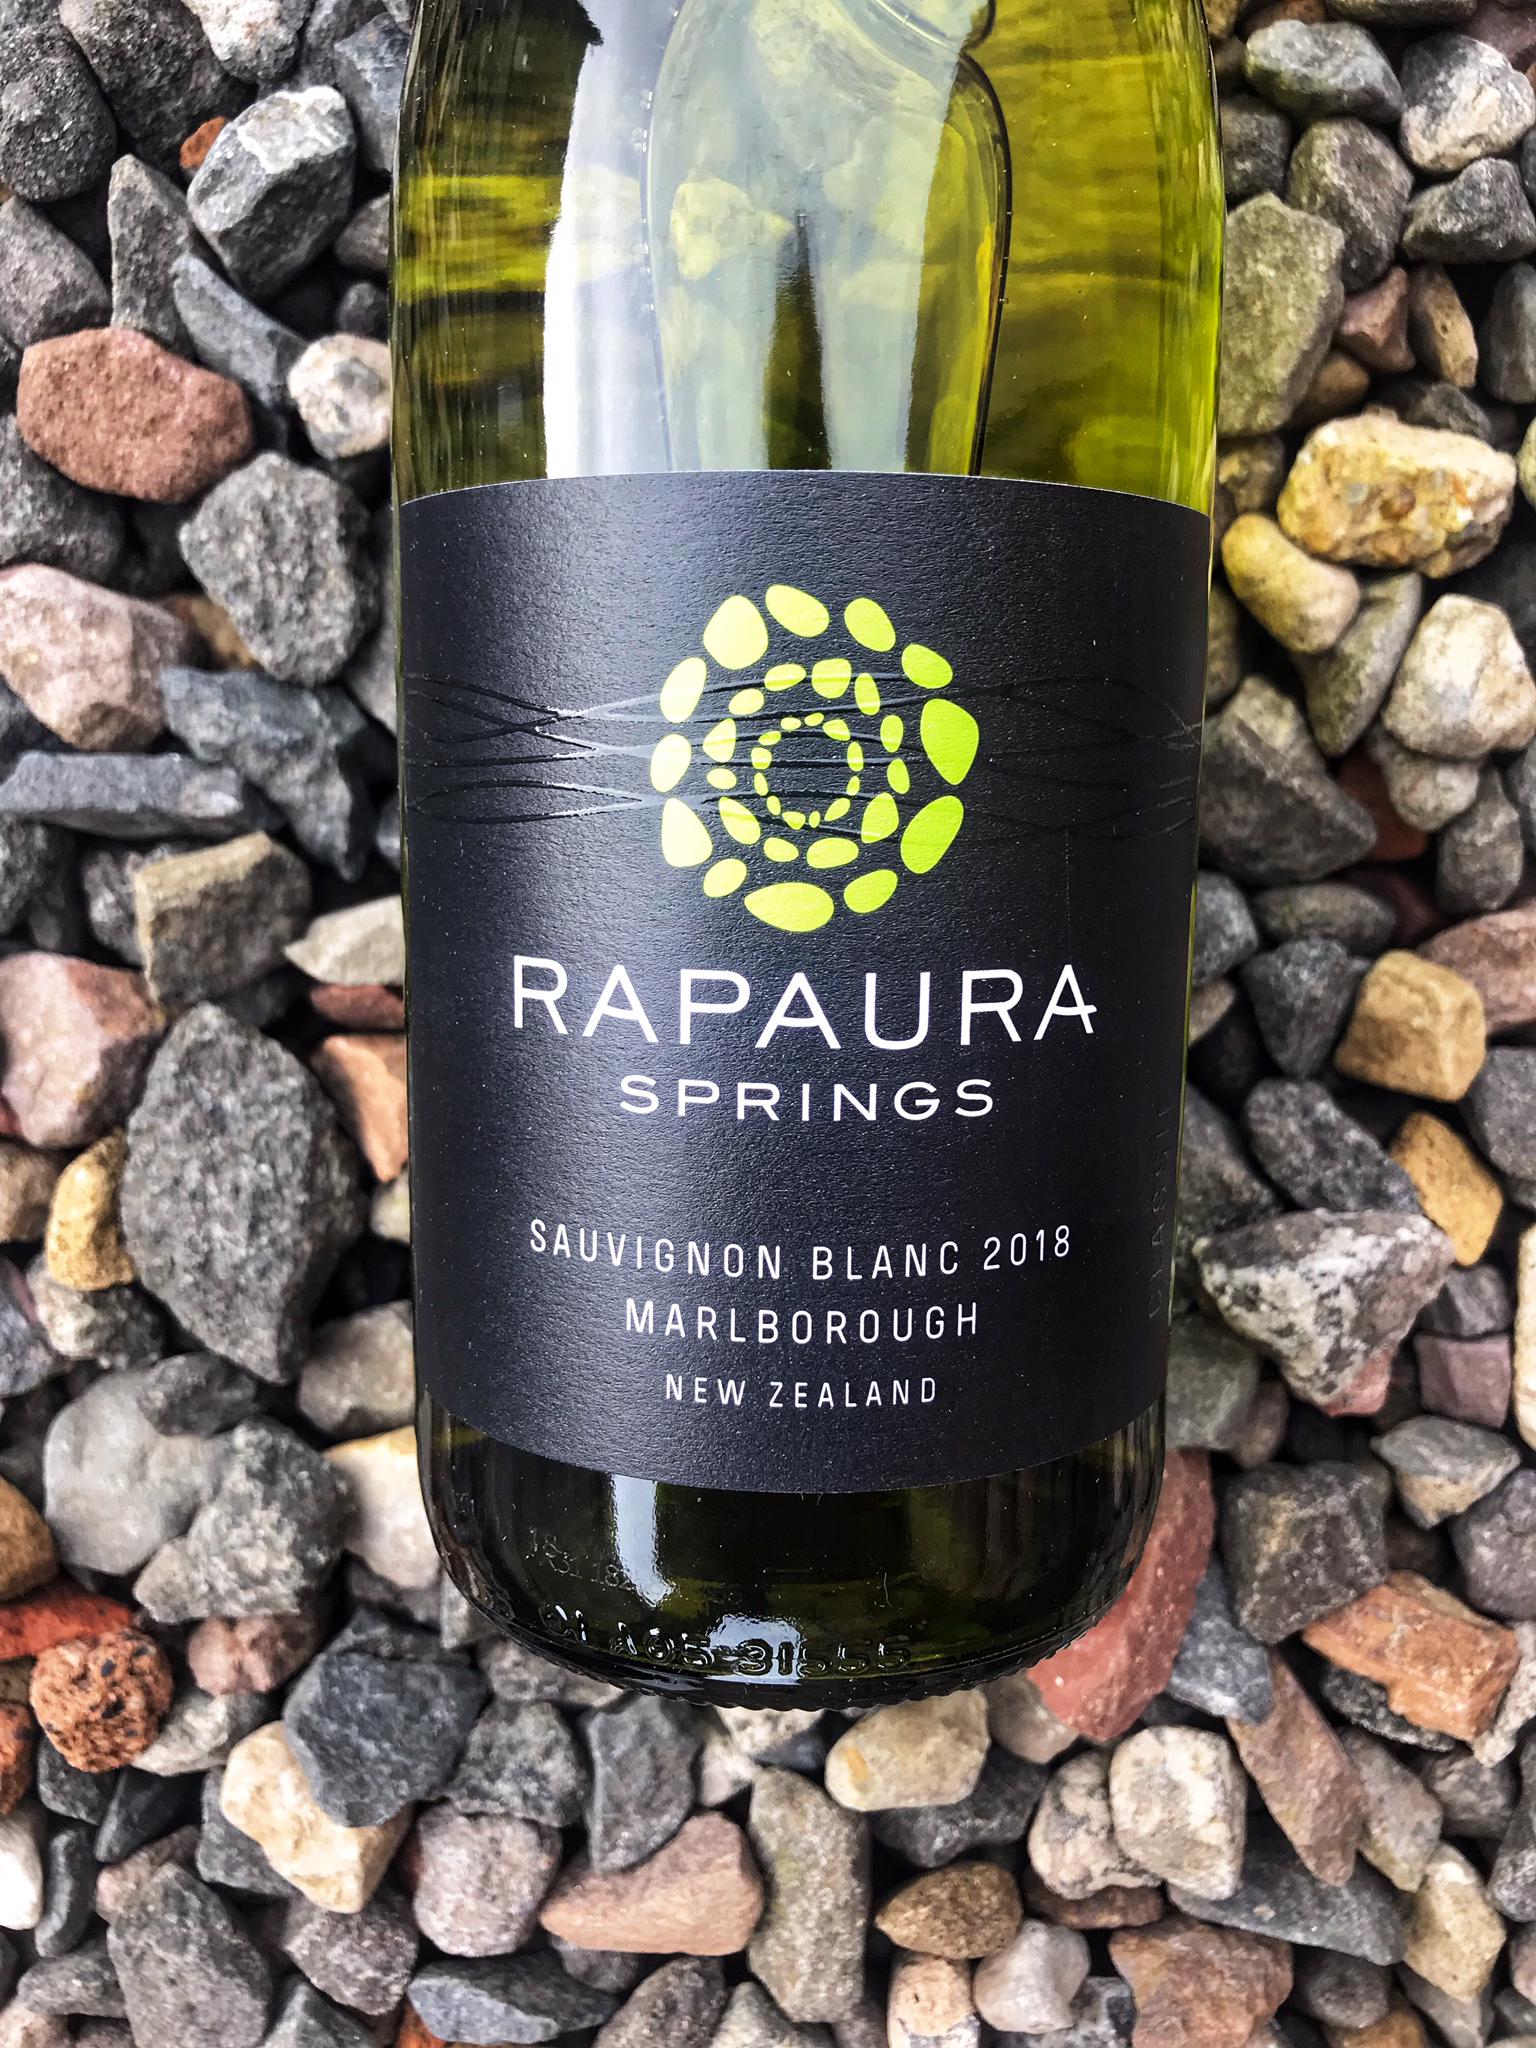 Rapaura Springs Sauvignon Blanc 2018 NZ1